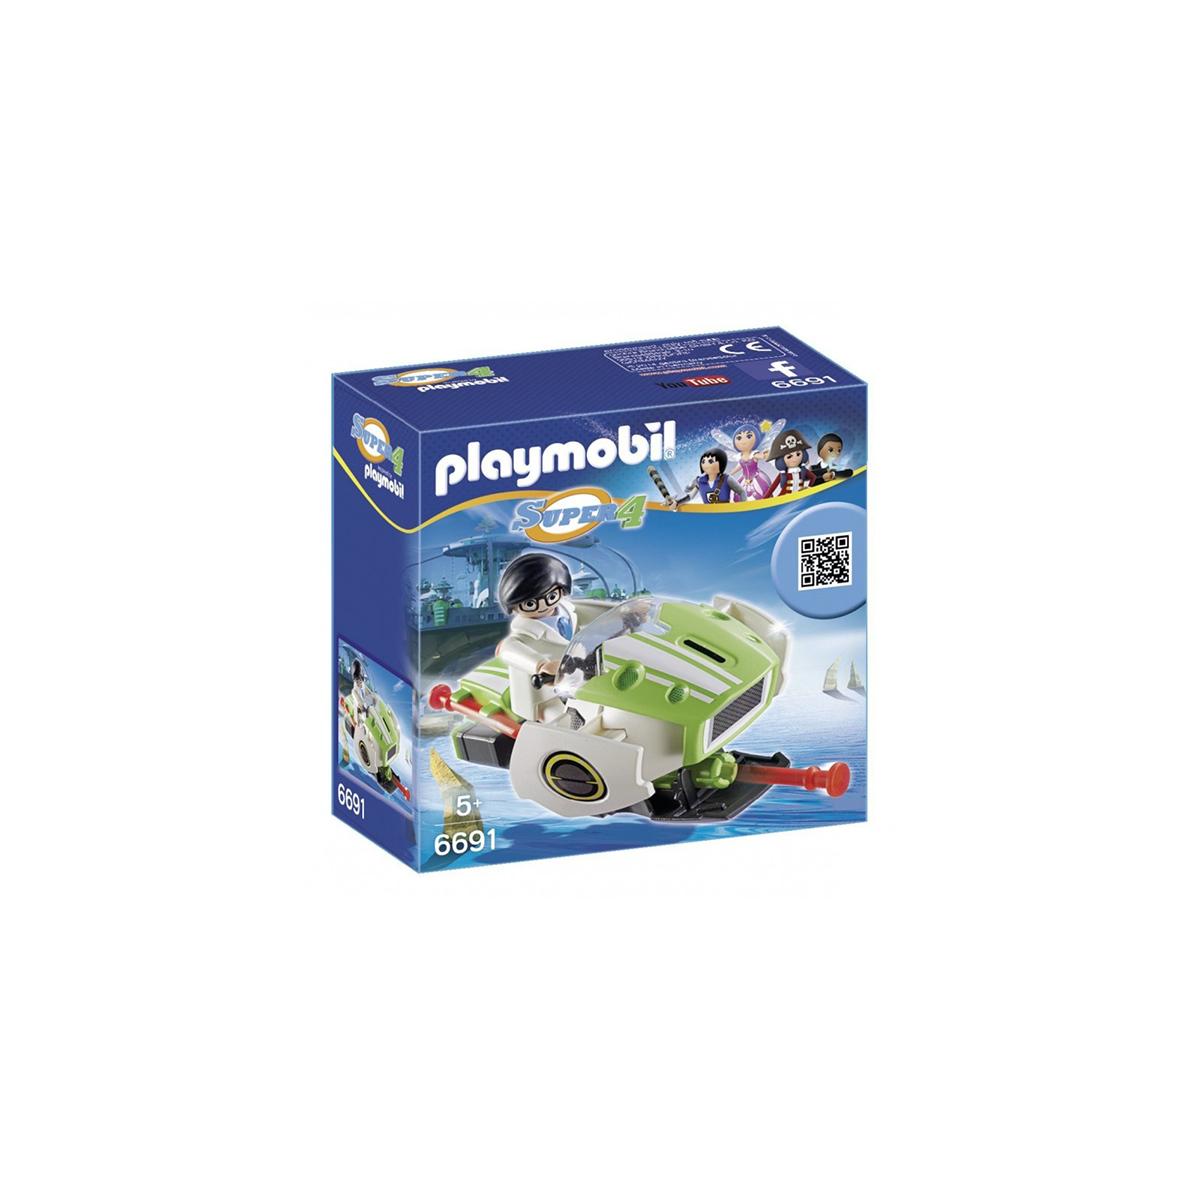 PLAYMOBIL SUPER 4 SKY JET 6691